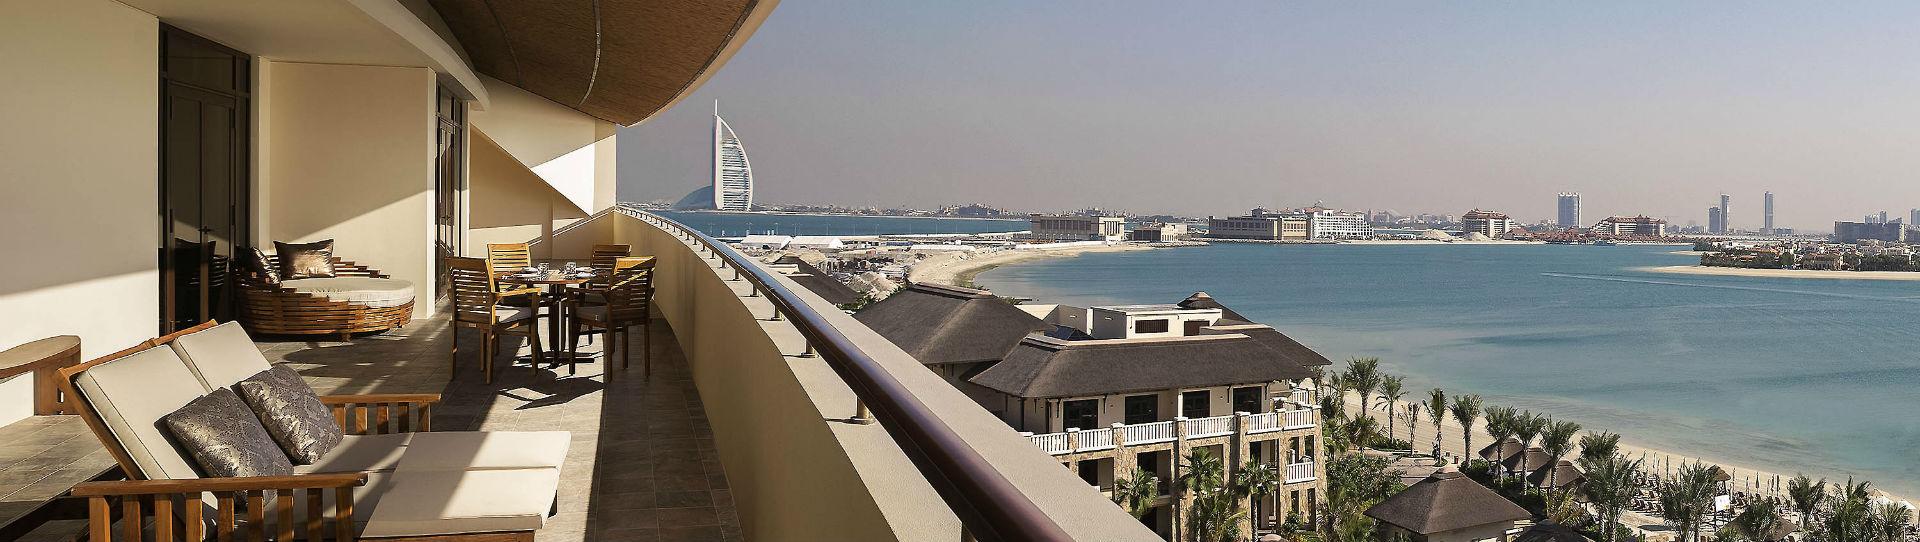 Sofitel The Palm, Dubai - balcony view